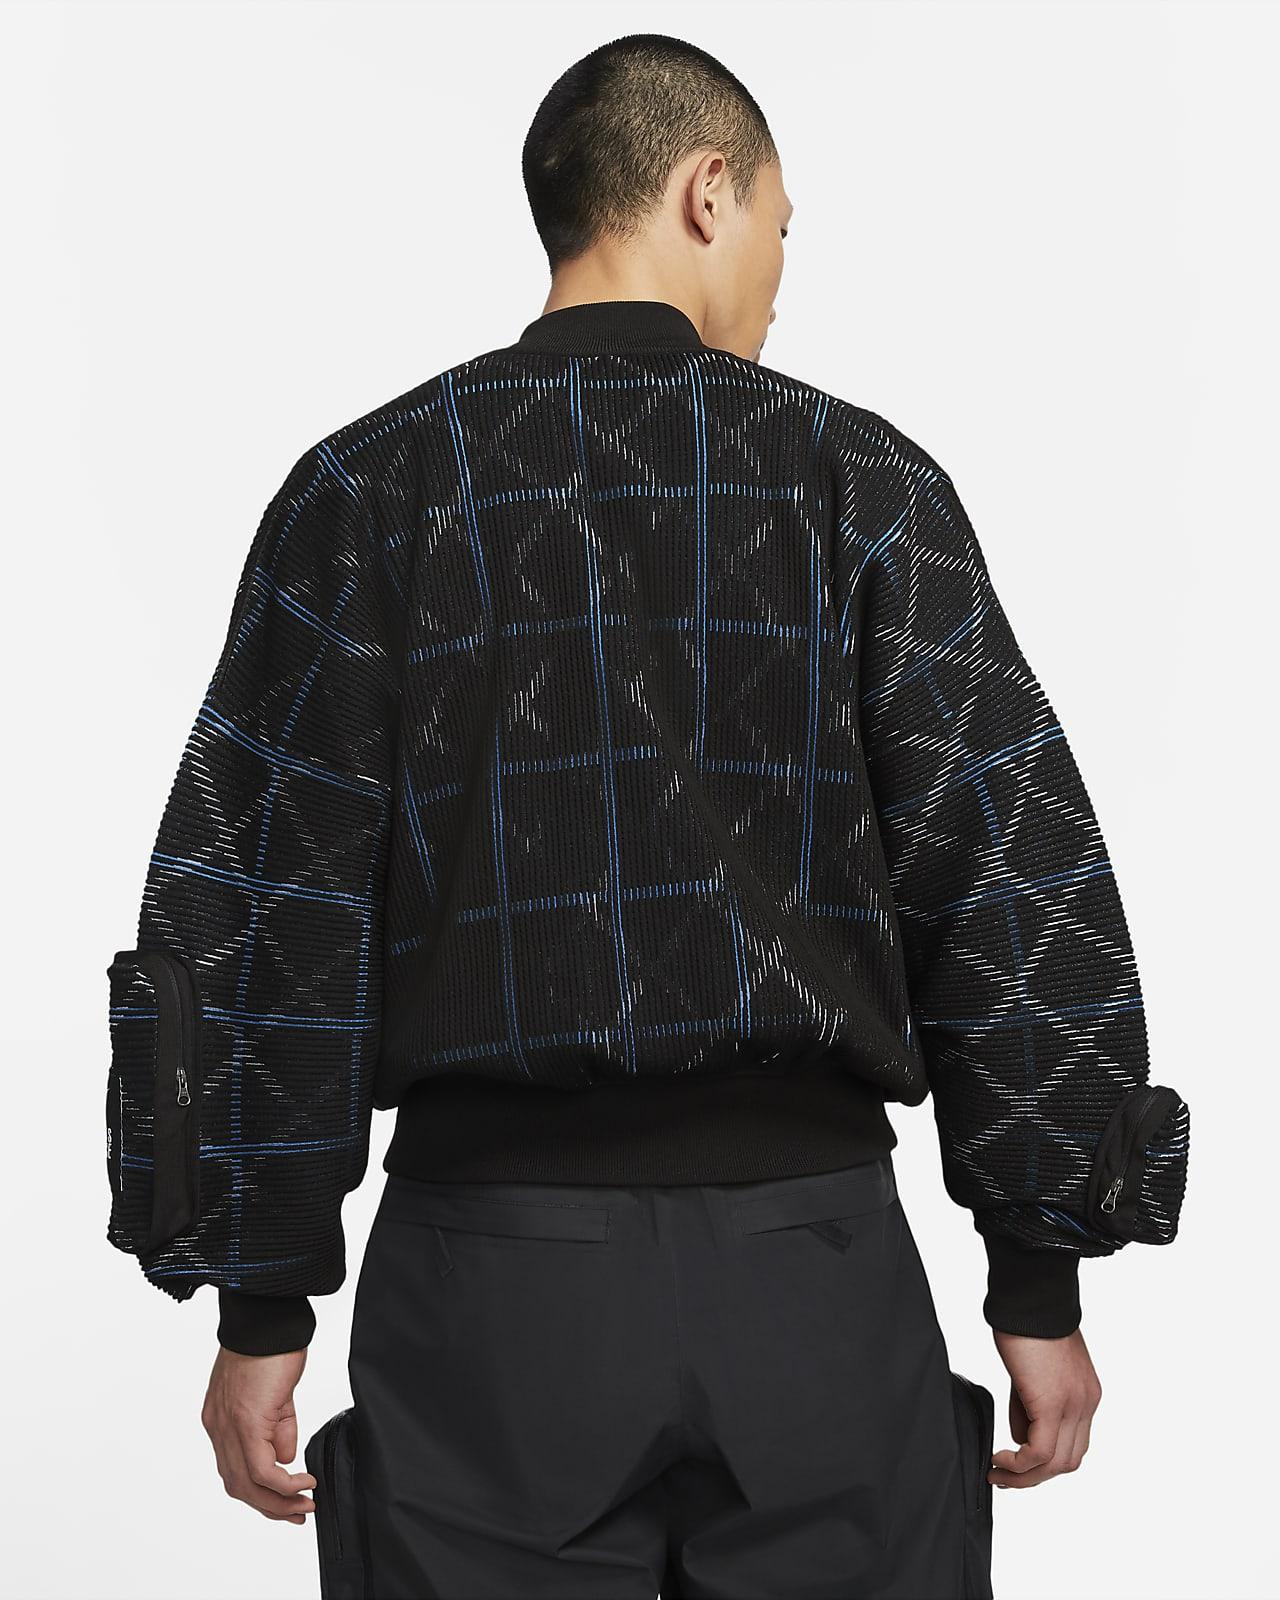 Nike x Undercover Knit MA-1 Bomber Jacket